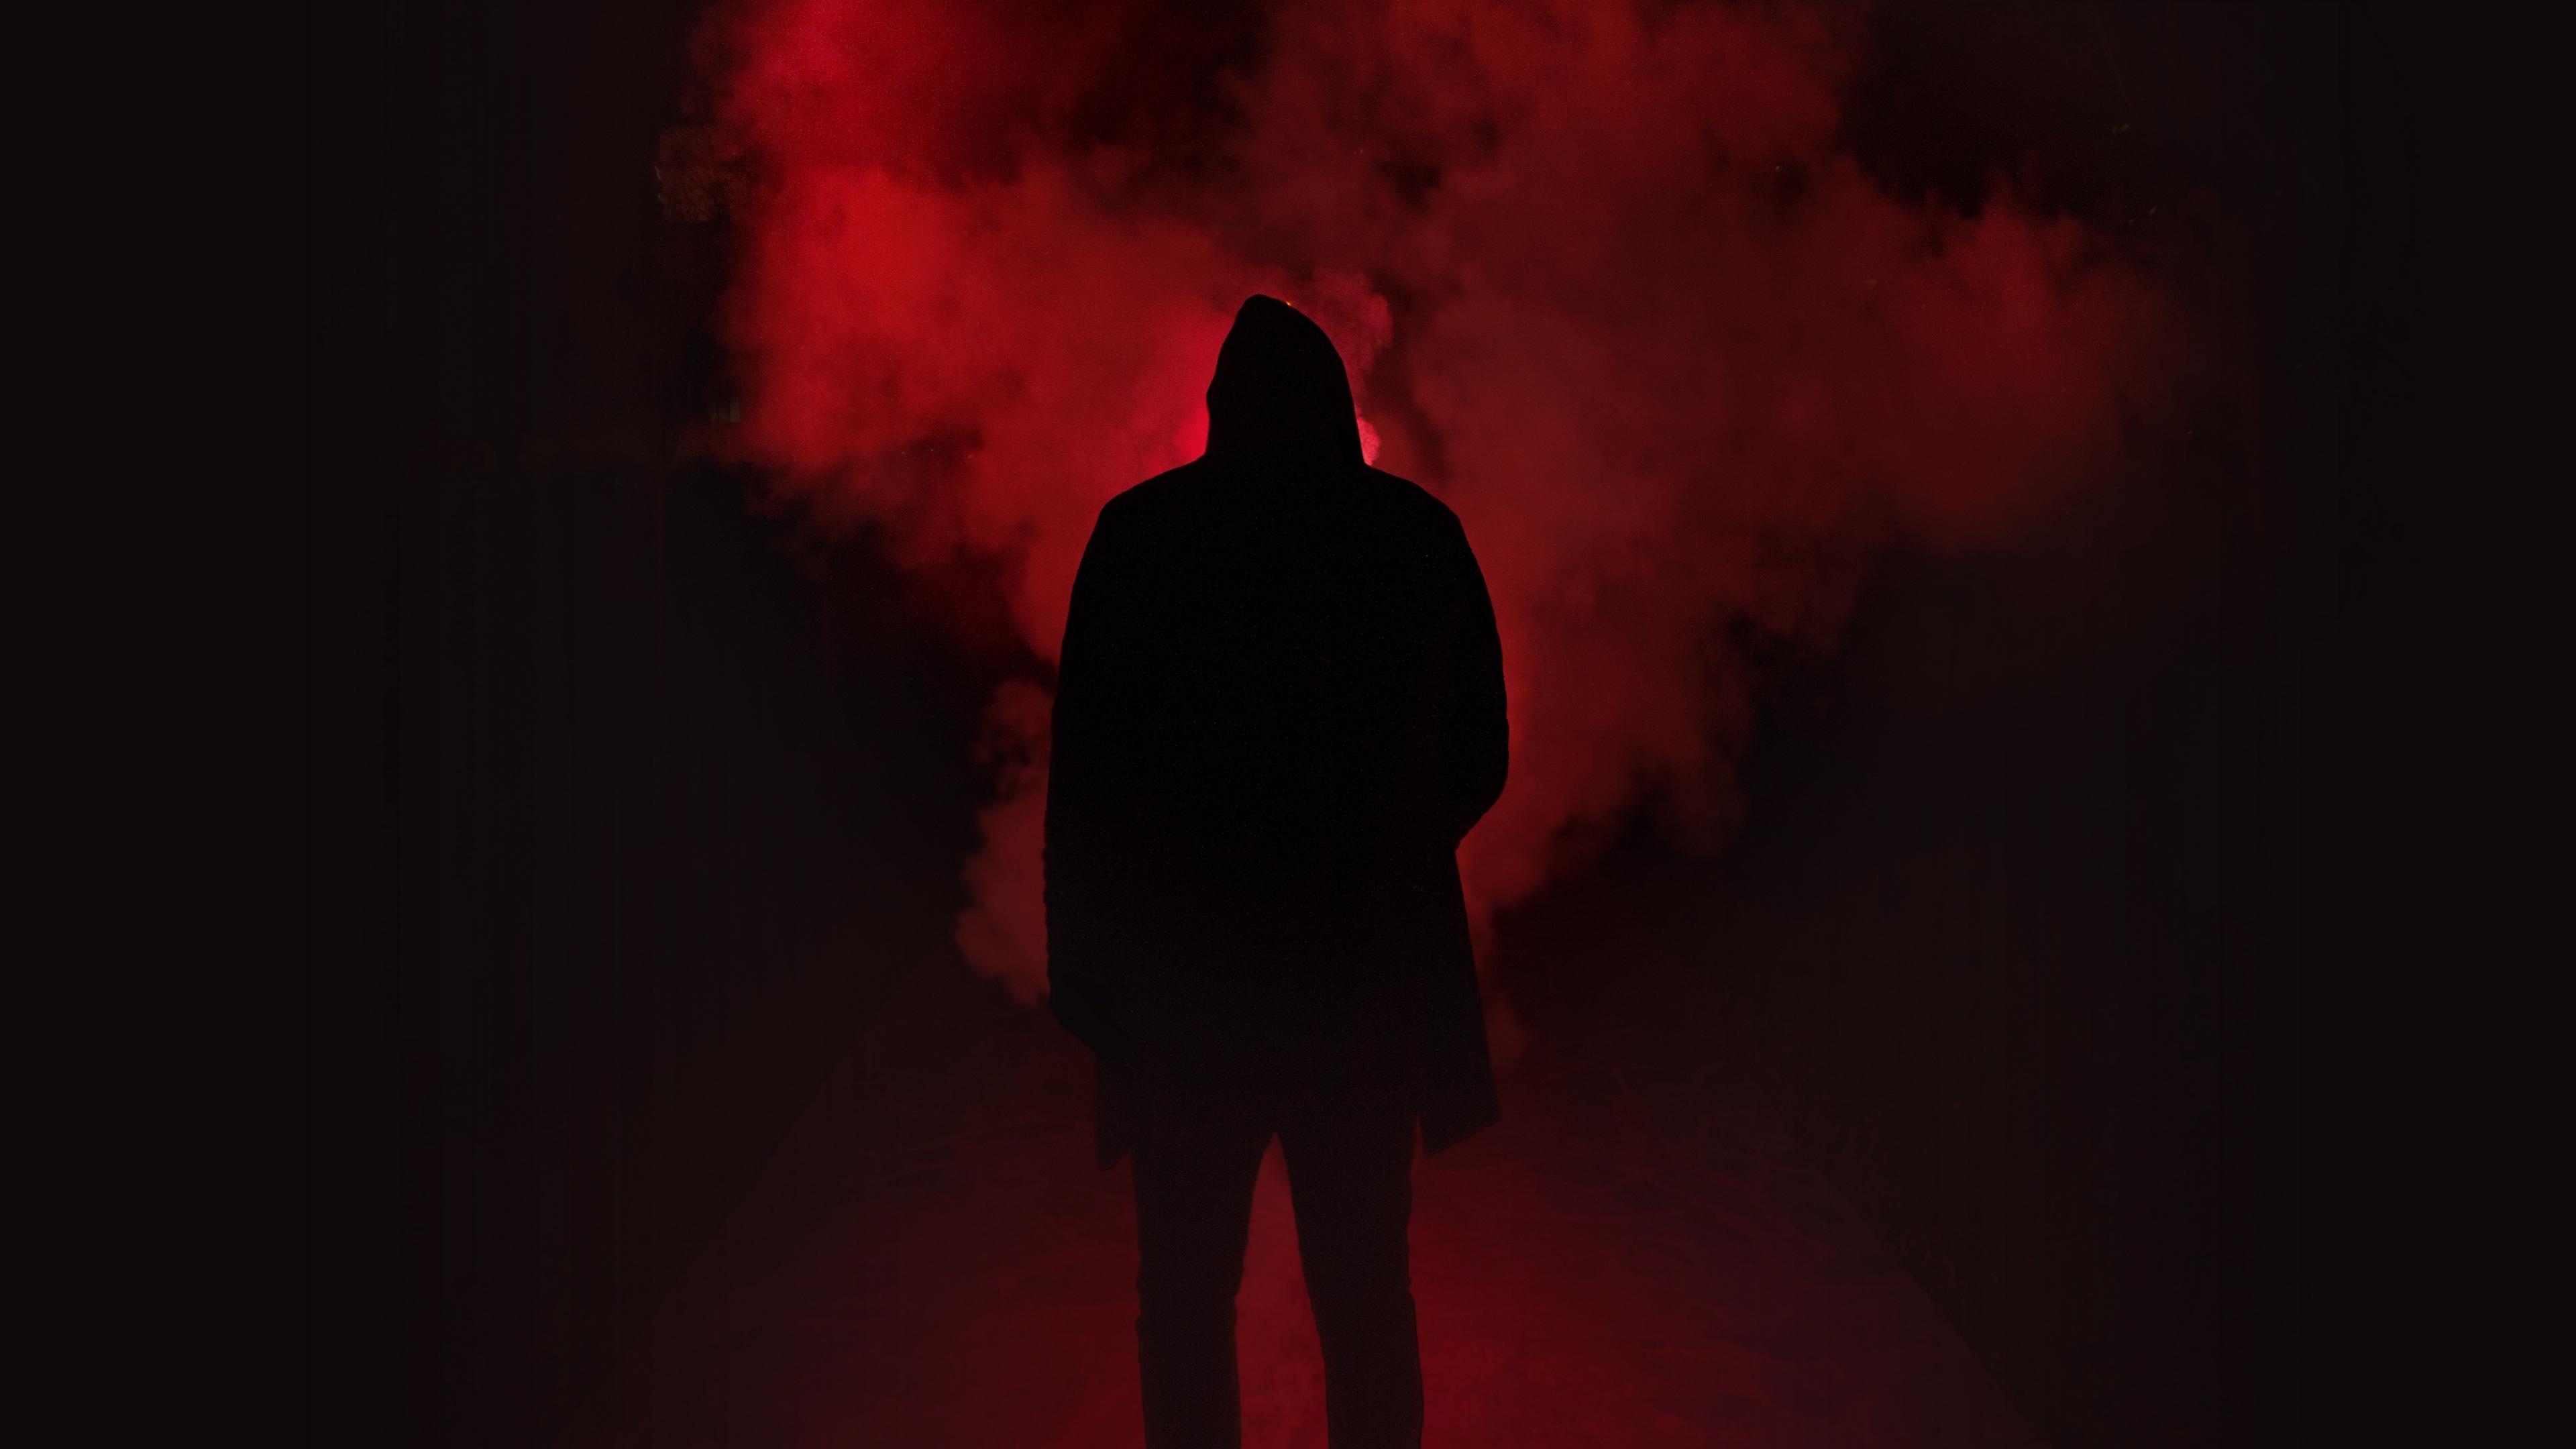 silhouette smoke man hood 4k 1540575218 - silhouette, smoke, man, hood 4k - Smoke, Silhouette, Man